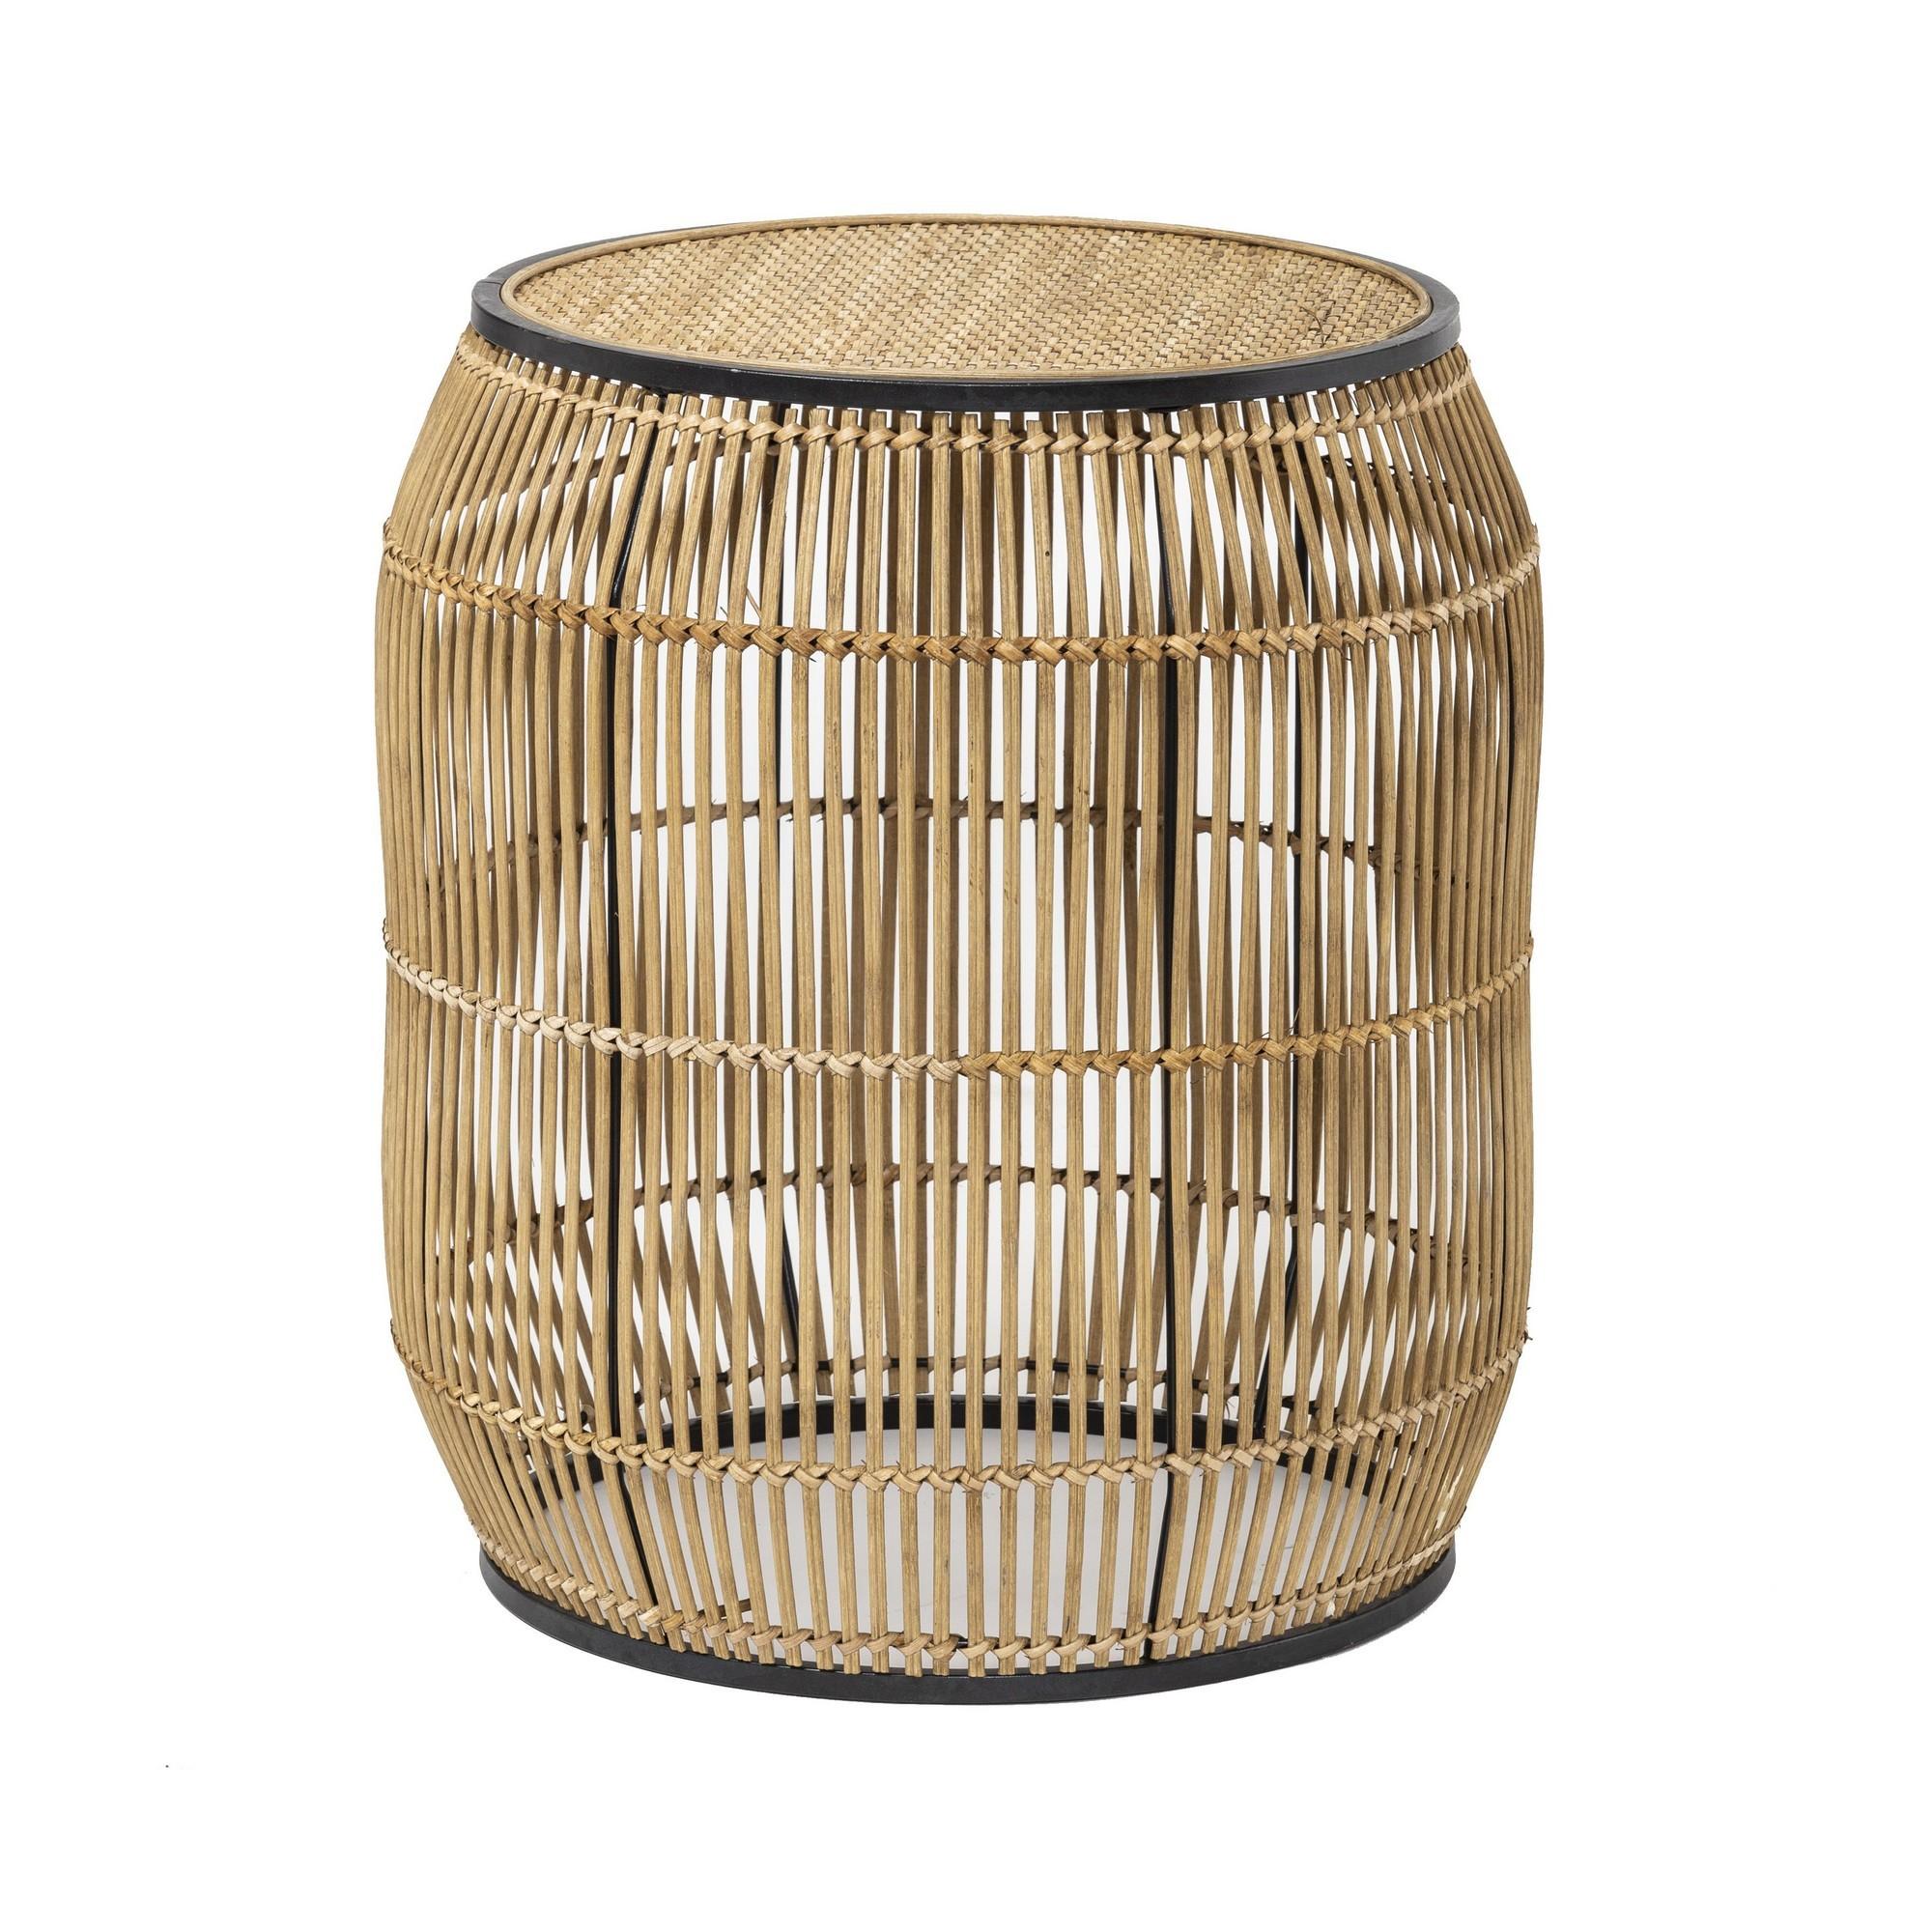 Pima Handmade Bamboo Rattan Round Side Table